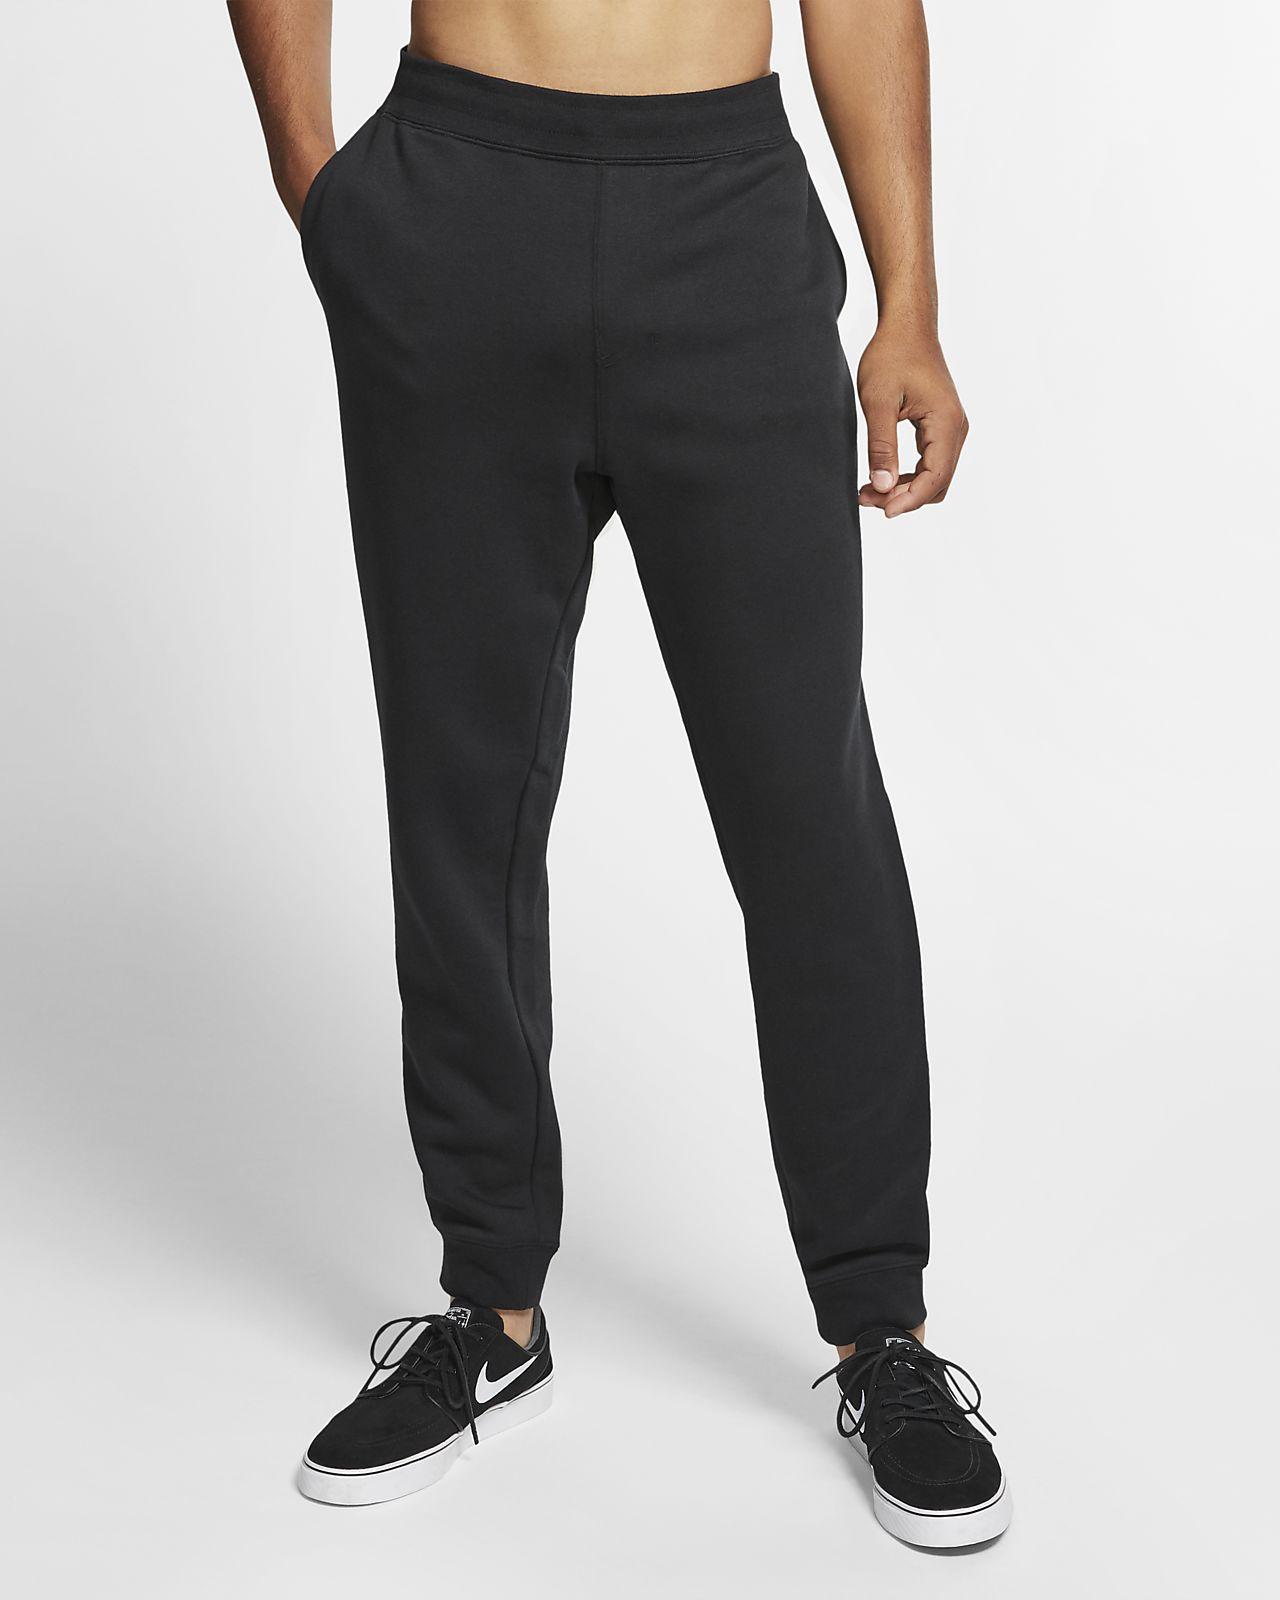 Pantalon de jogging en tissu Fleece Hurley Surf Check pour Homme